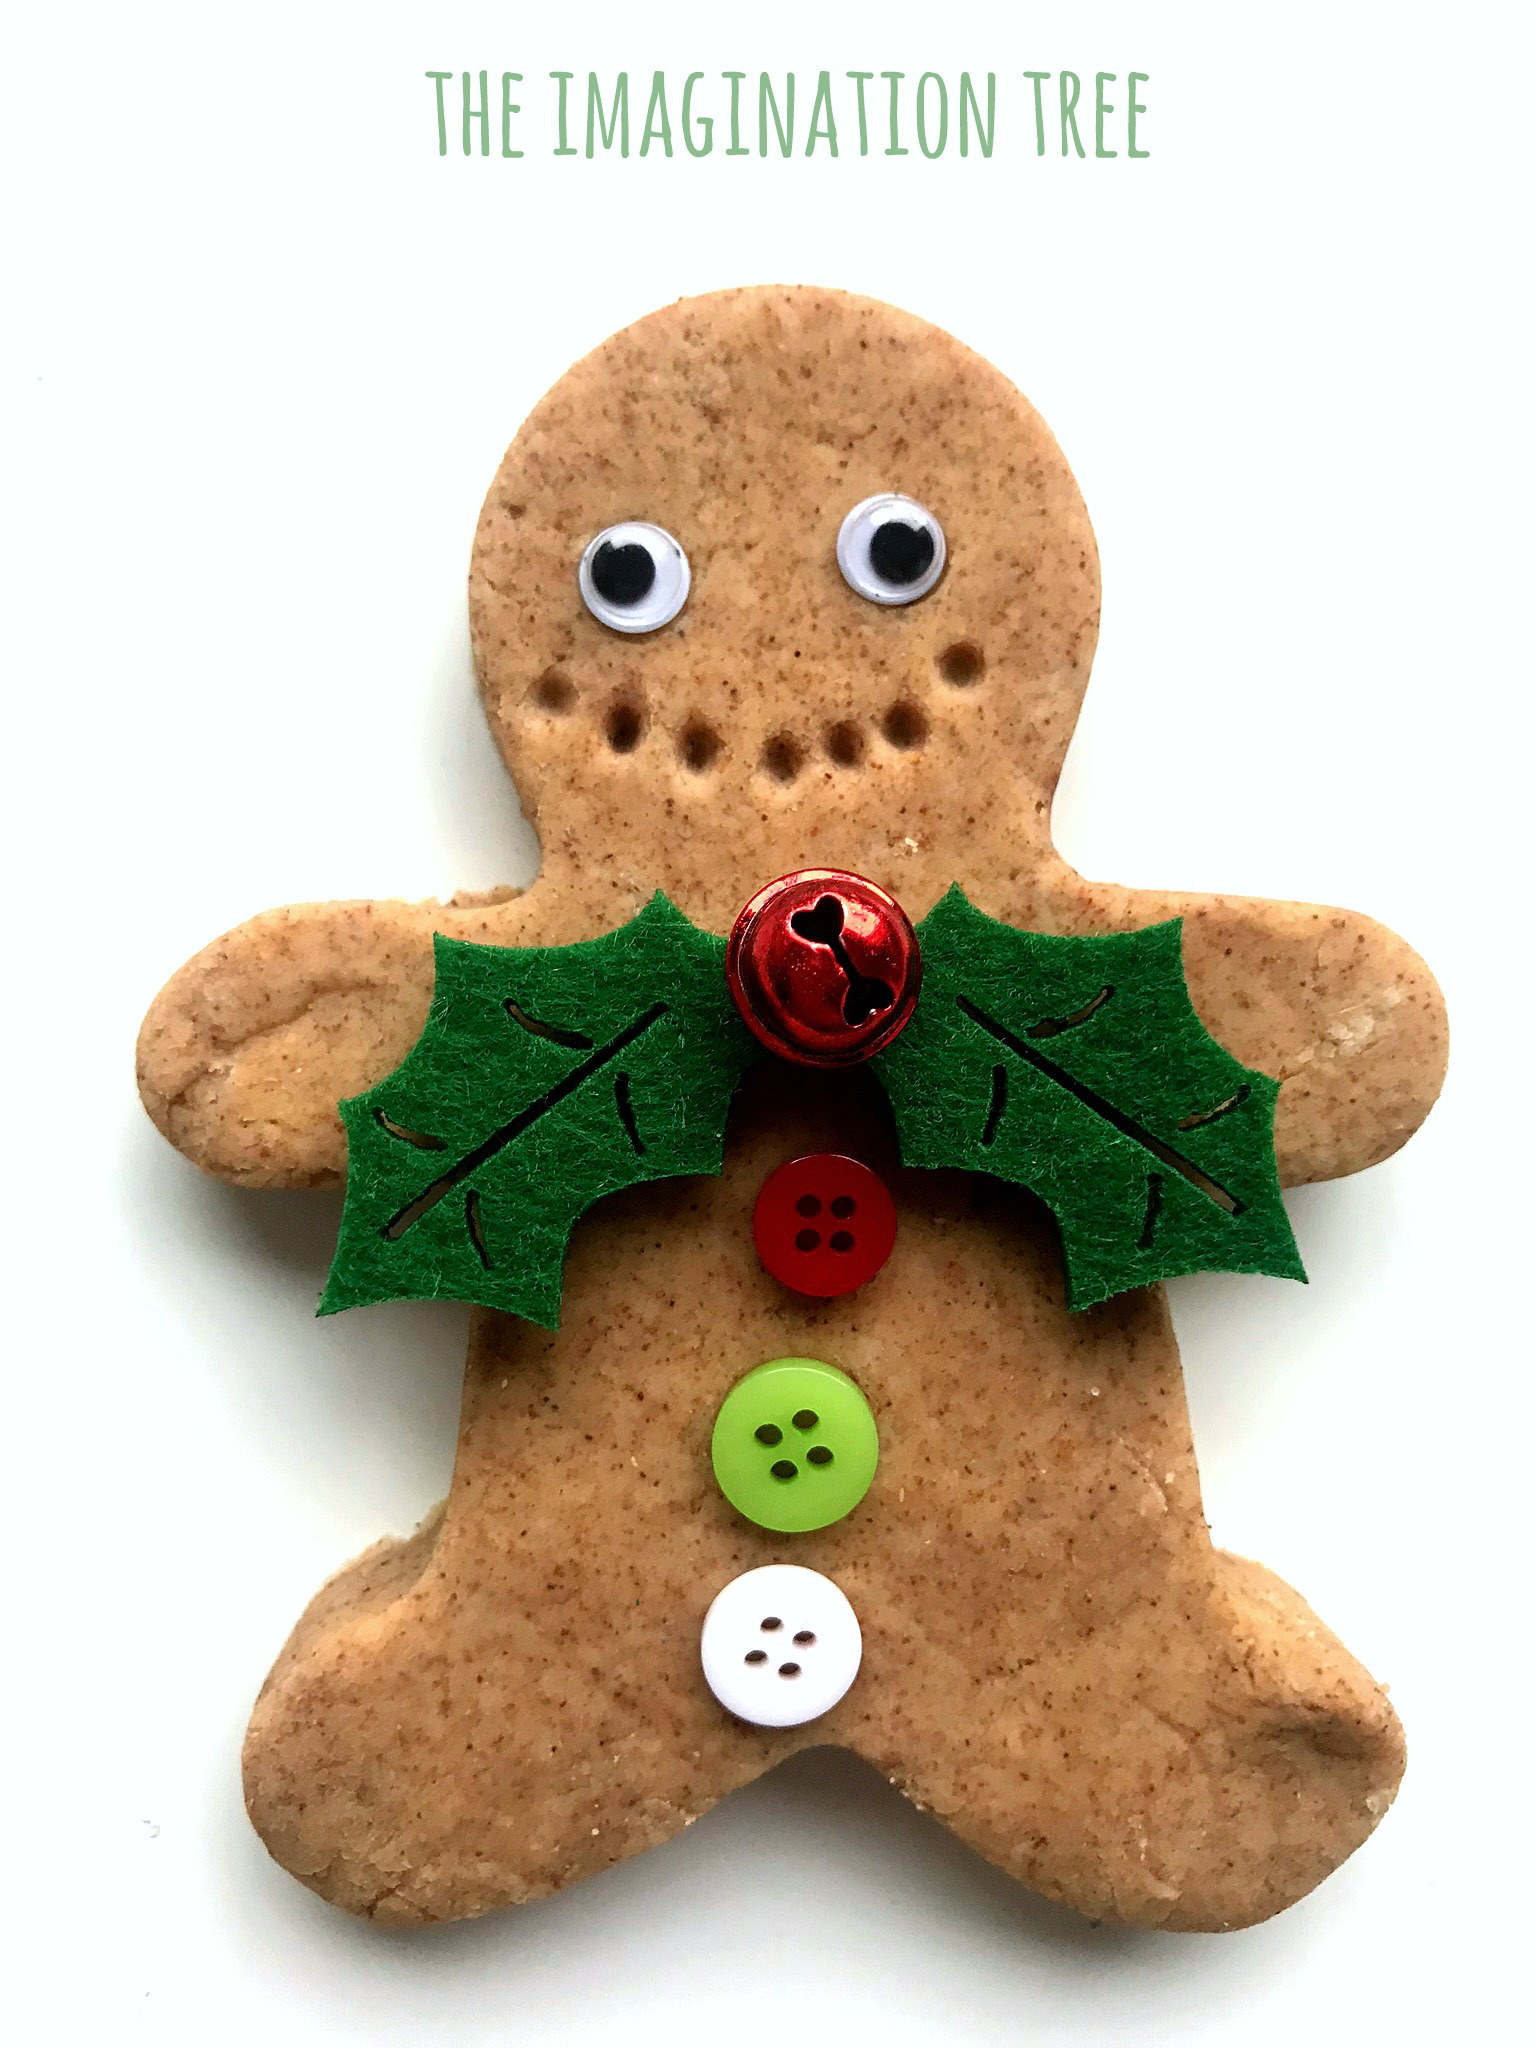 No-Cook Gingerbread Play Dough Recipe